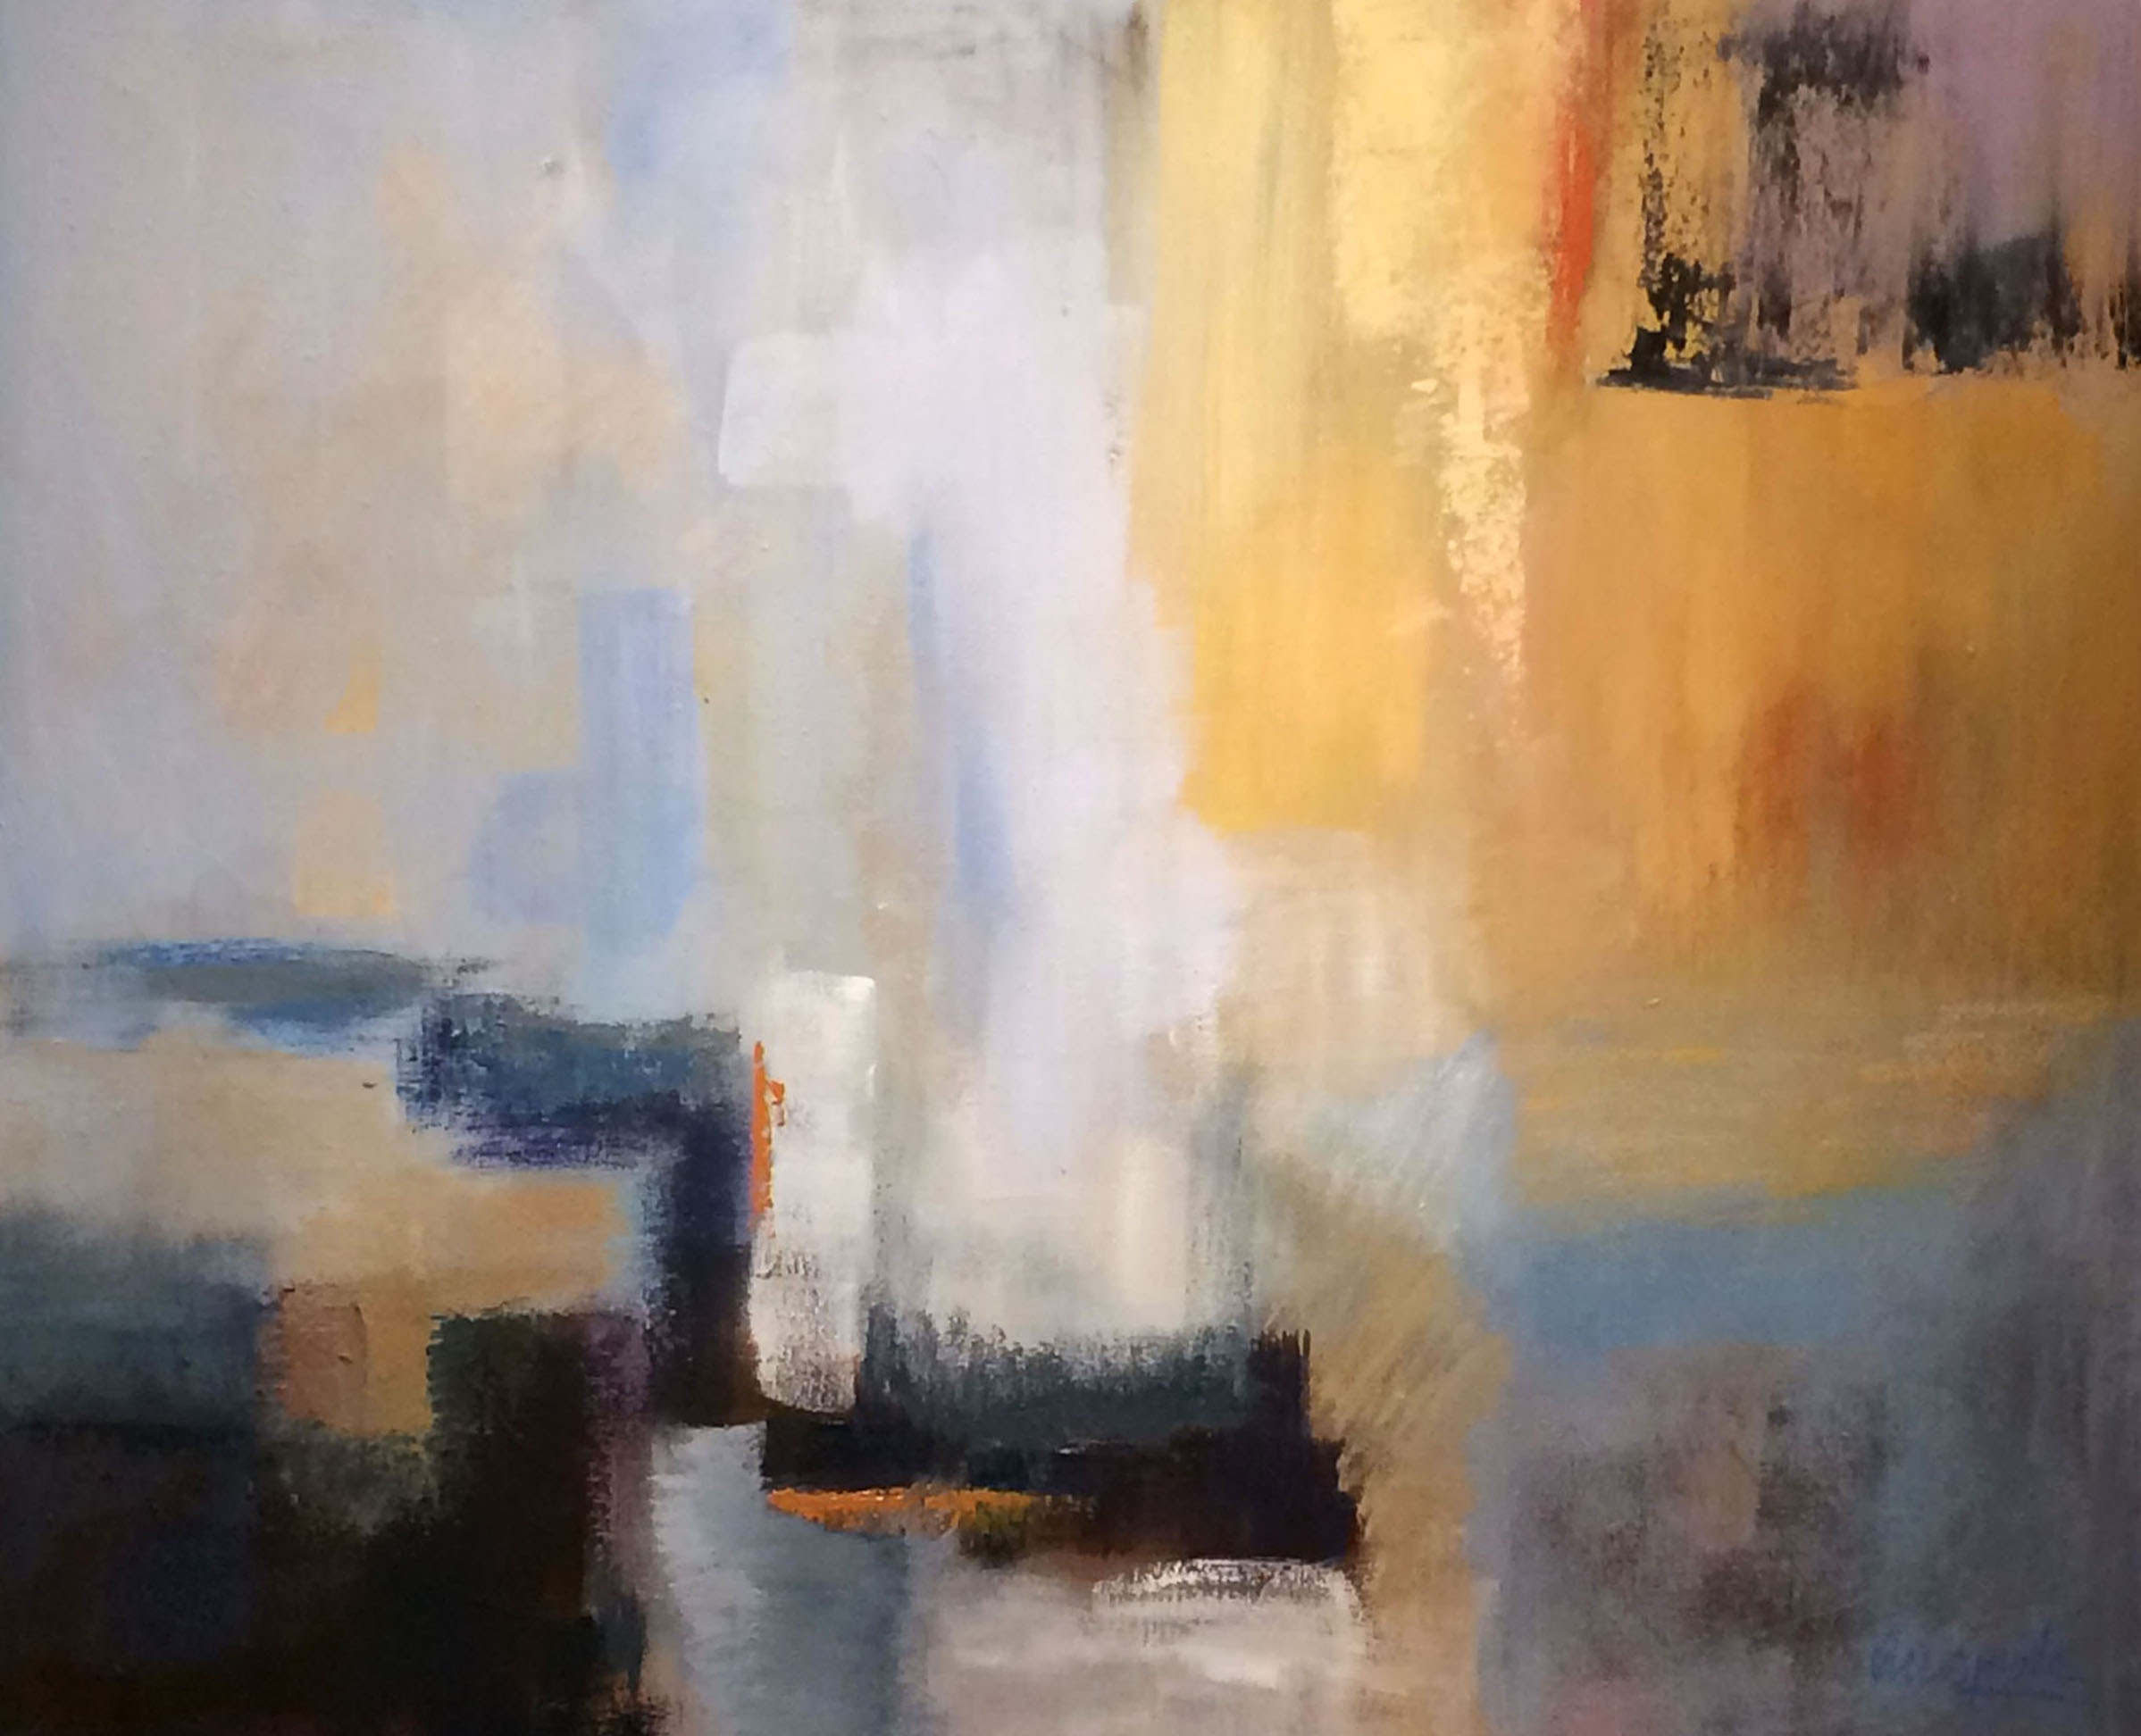 SUNSHINE Oleo sobre lienzo, 85 x 70 cm, 33 x 27 in